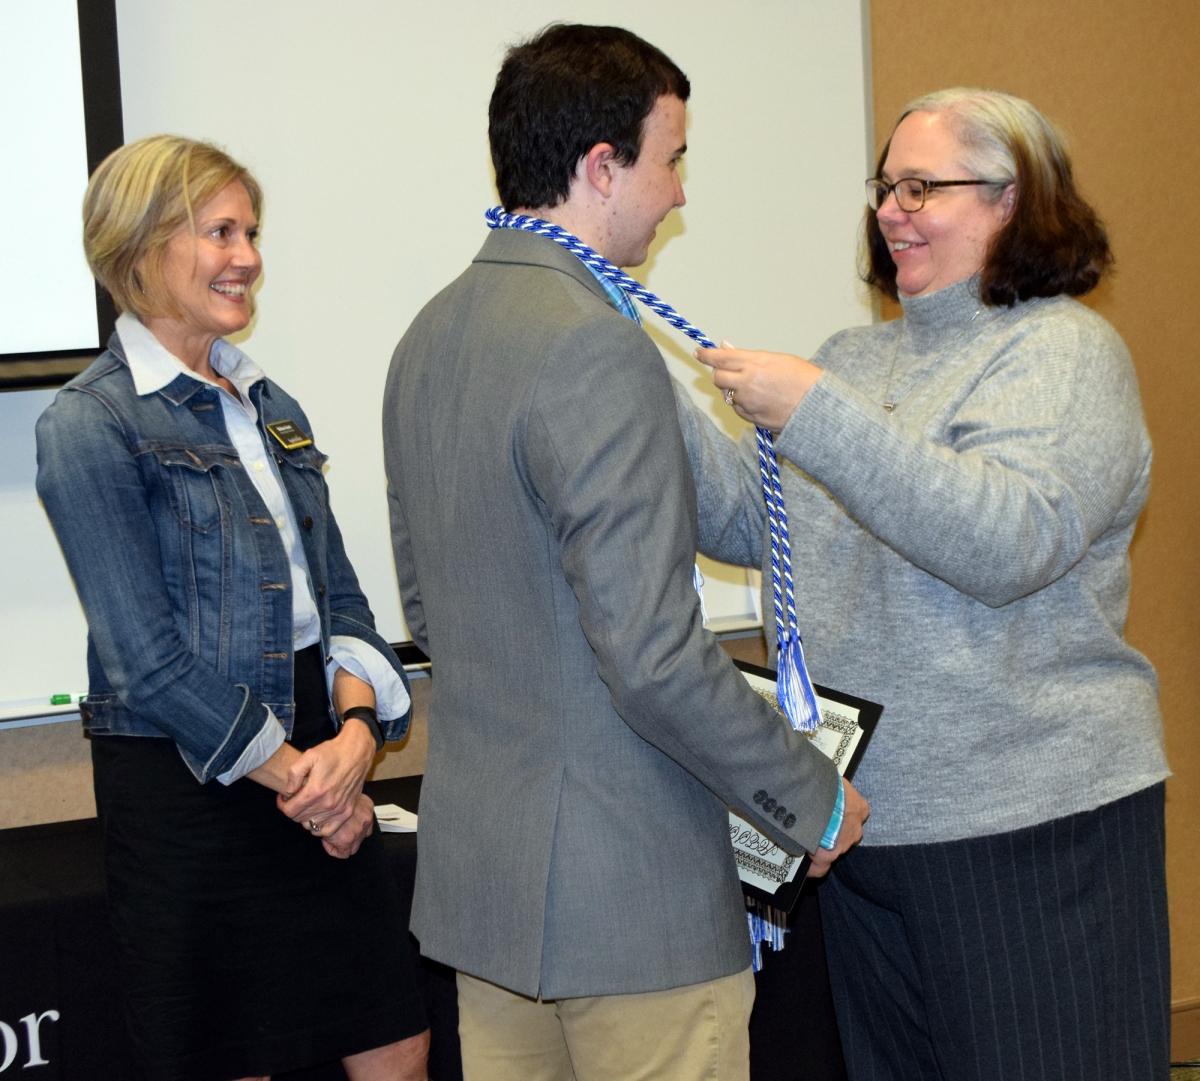 Robert Hinchcliffe and mom at honors ceremony